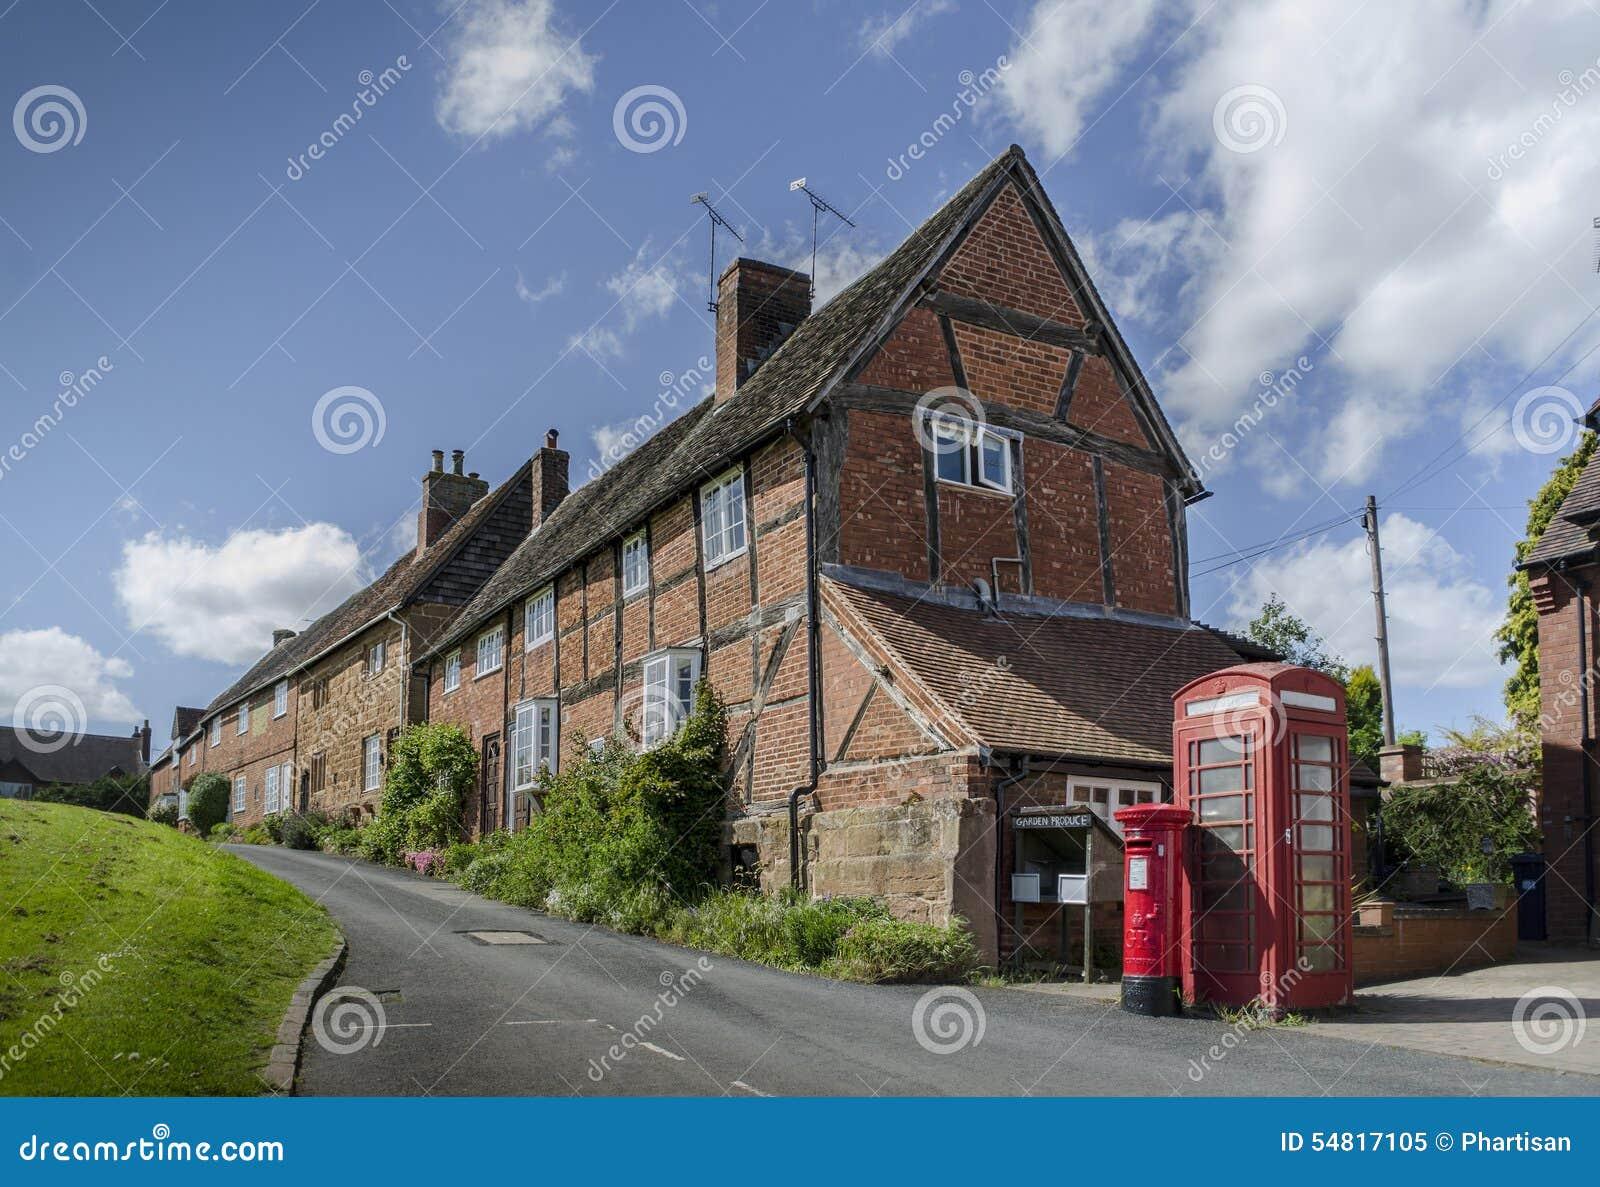 Stock Photo Quaint Charming British Village Scene English Kenilworth Image54817105 on Old European Cottages